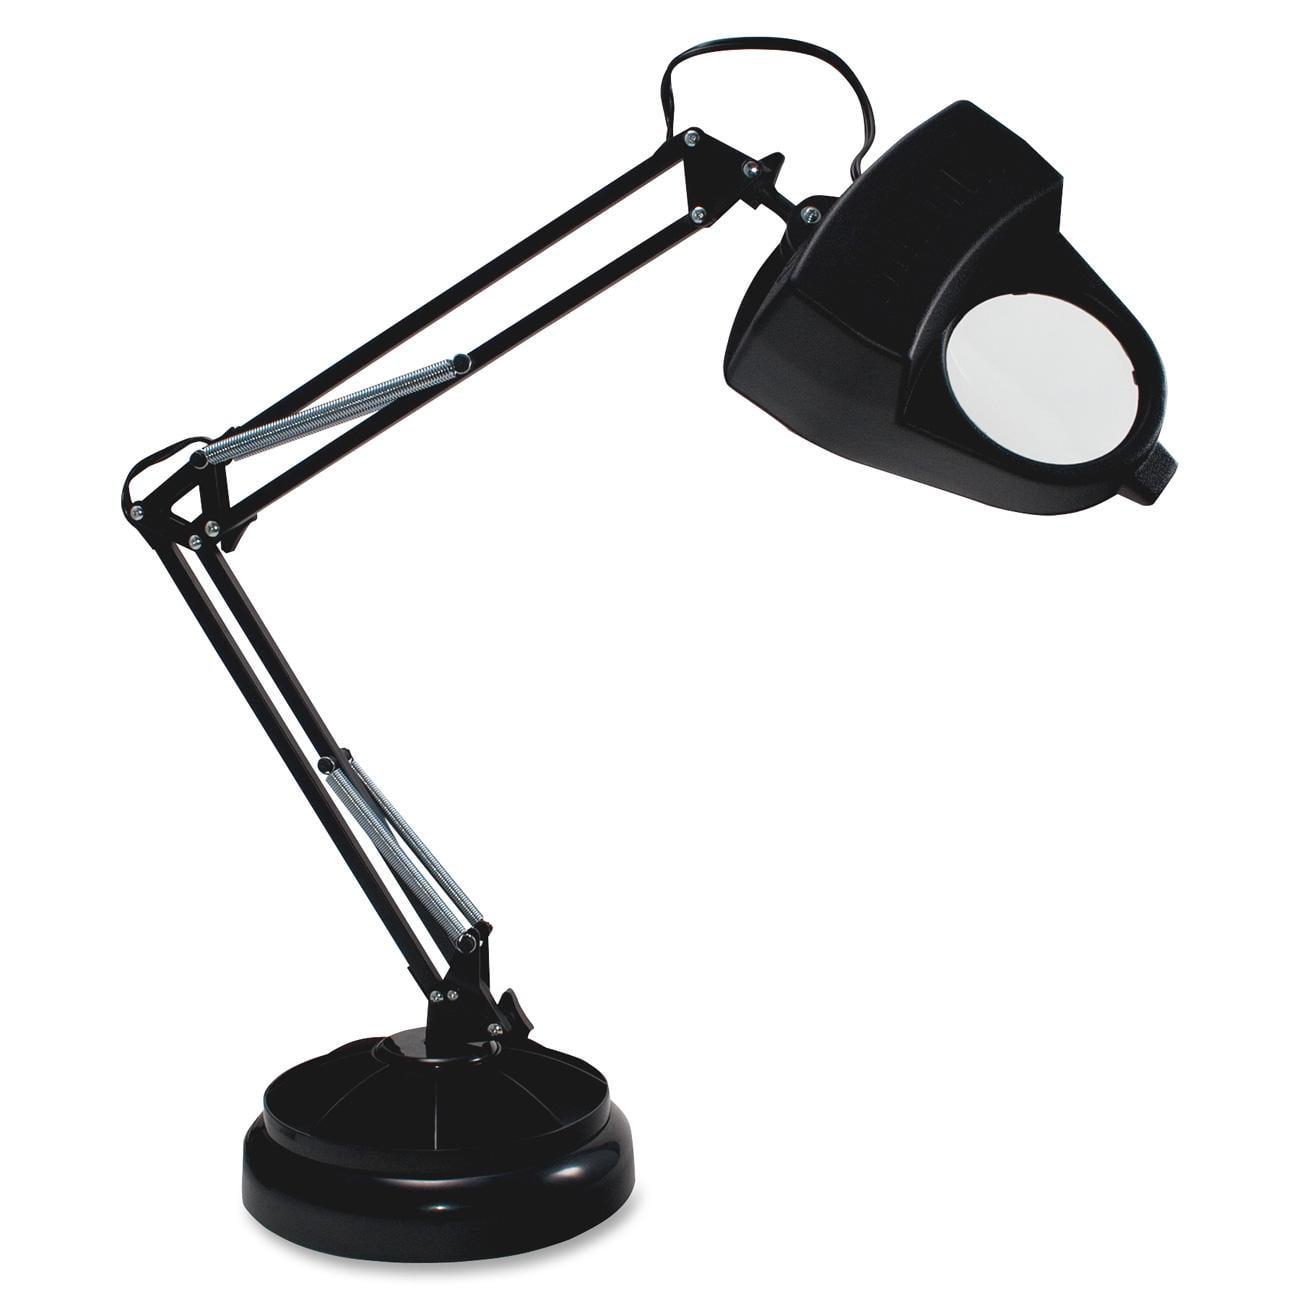 Ledu Magnifier Lamp - 15 W Bulb - Desk Mountable - Black (L9087)